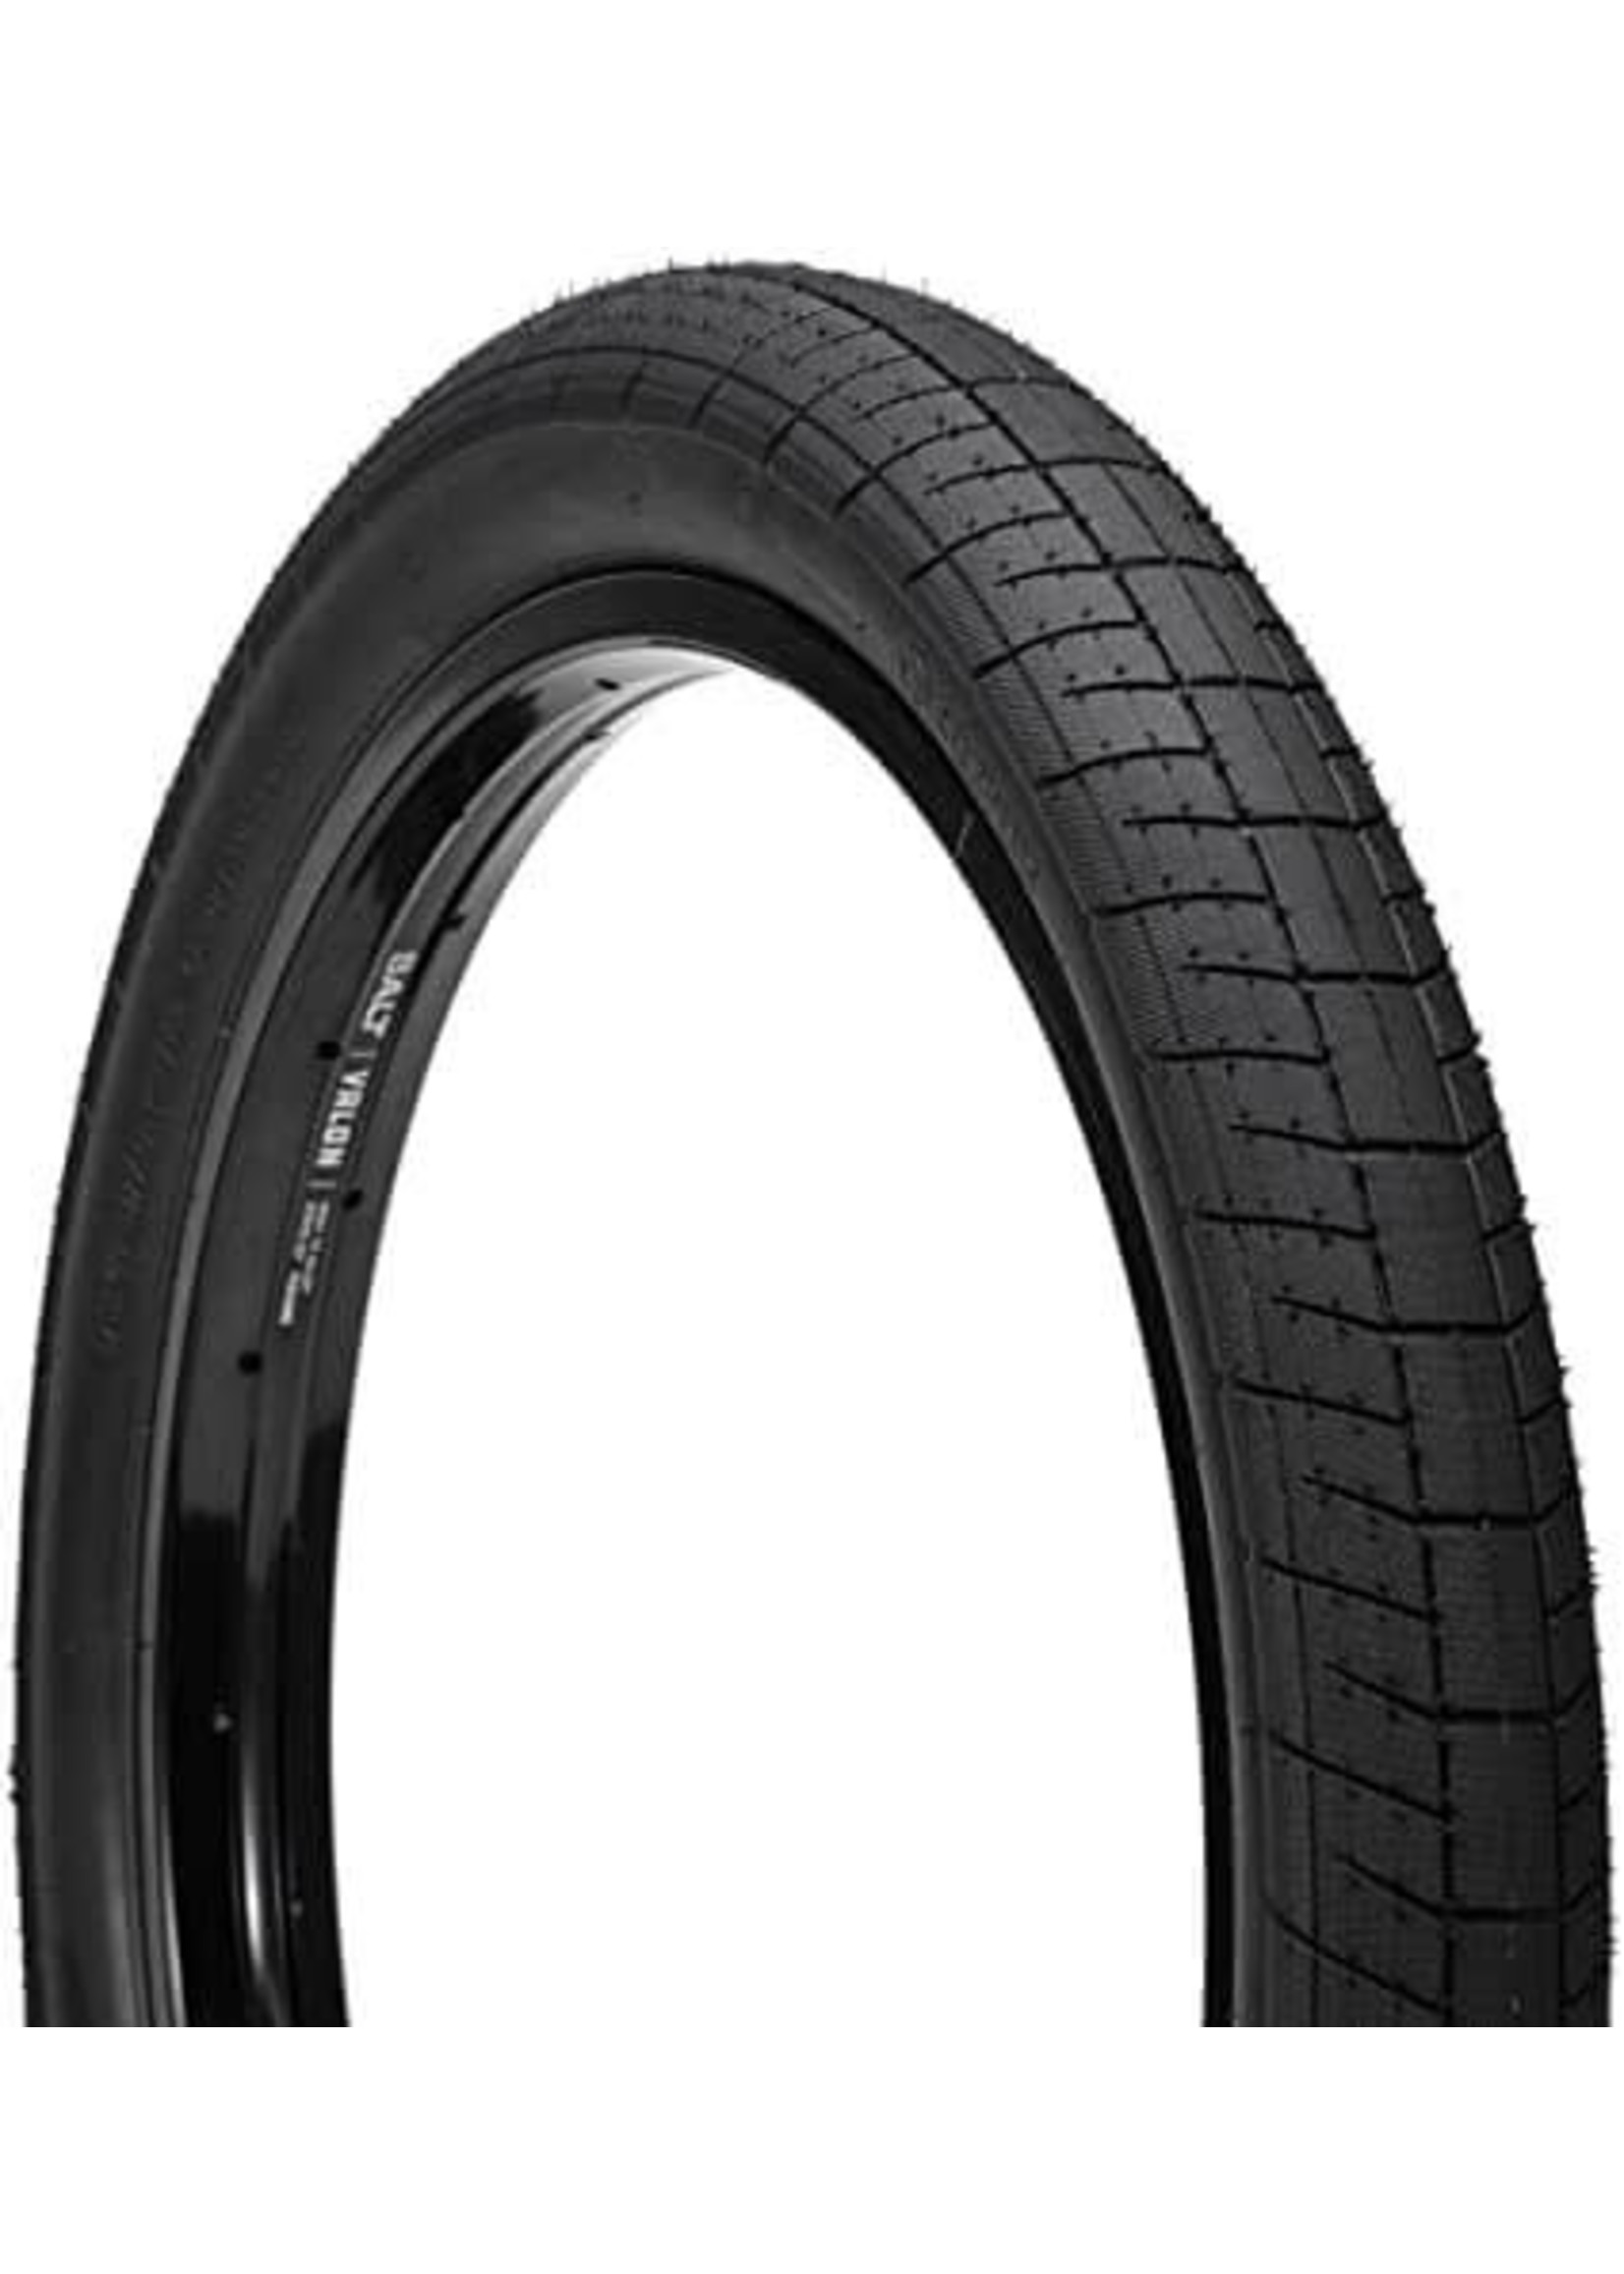 "Salt Salt Plus - Sting tire - 2.35"""